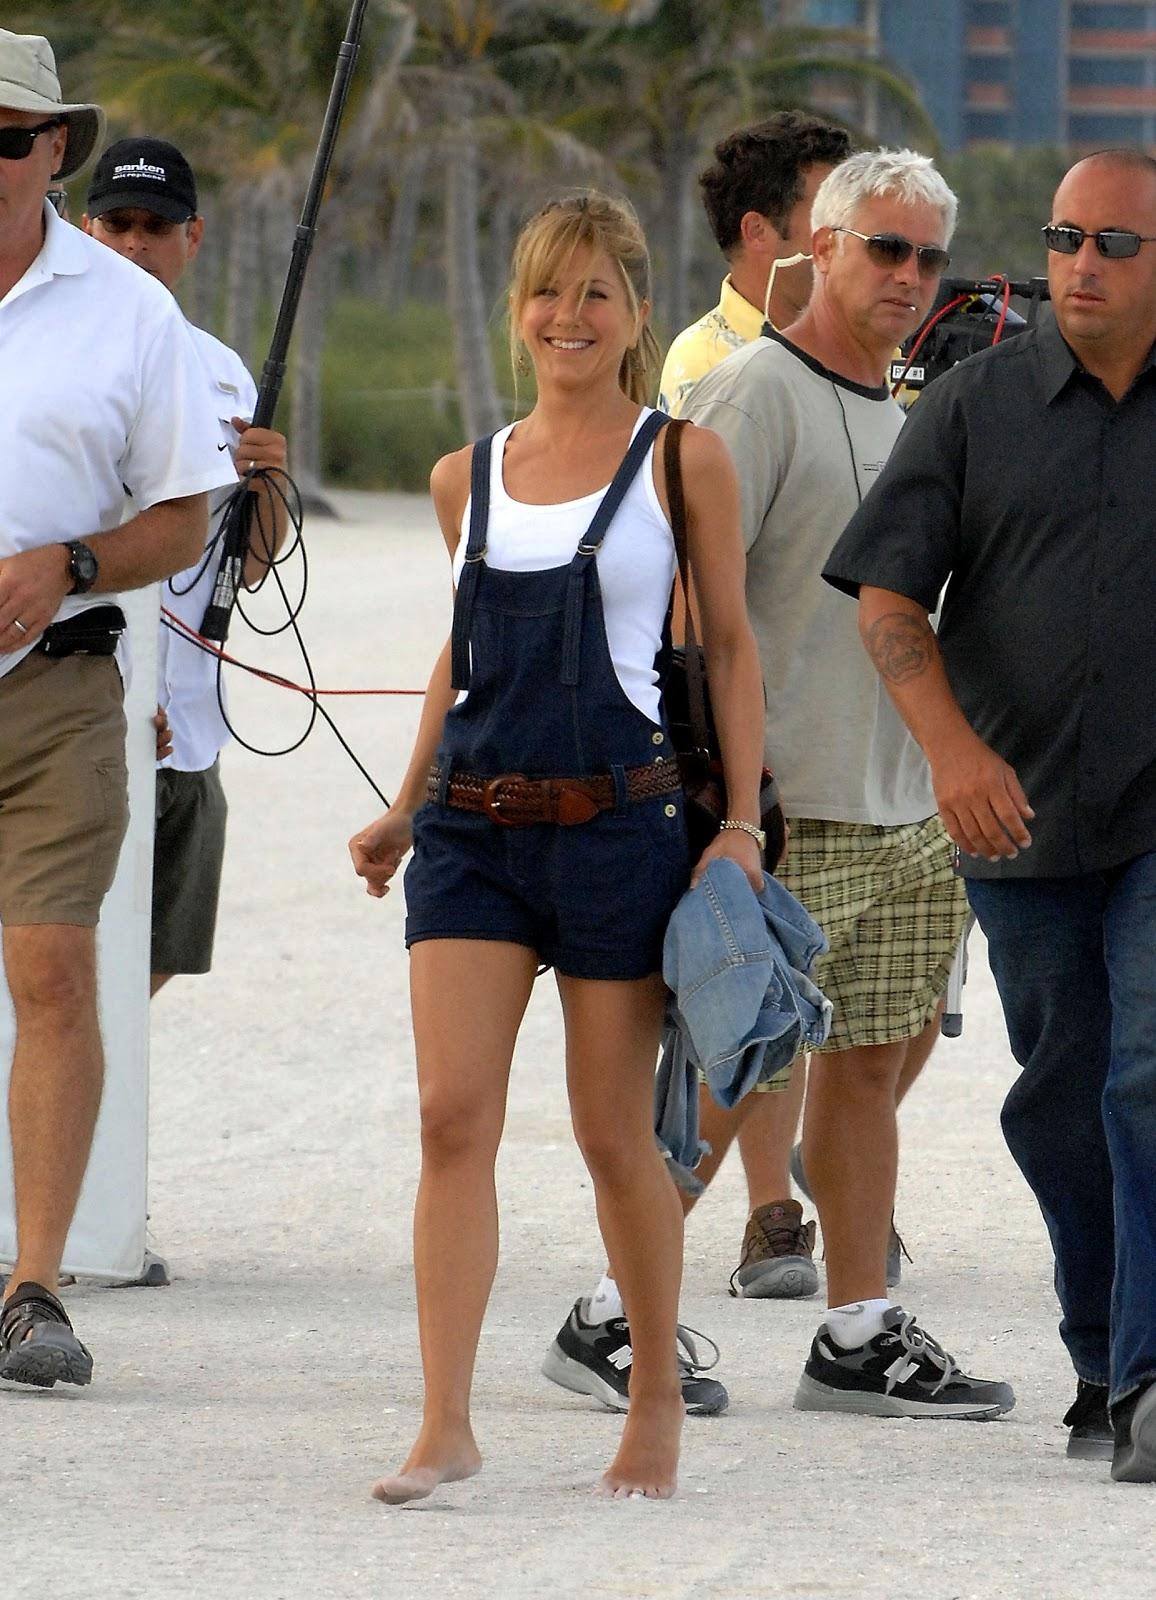 http://2.bp.blogspot.com/-gAcv67HVpxg/Txcn9l6KrVI/AAAAAAAAAiE/dF12oCi8uvs/s1600/Jennifer-Aniston-Feet-306410.jpg